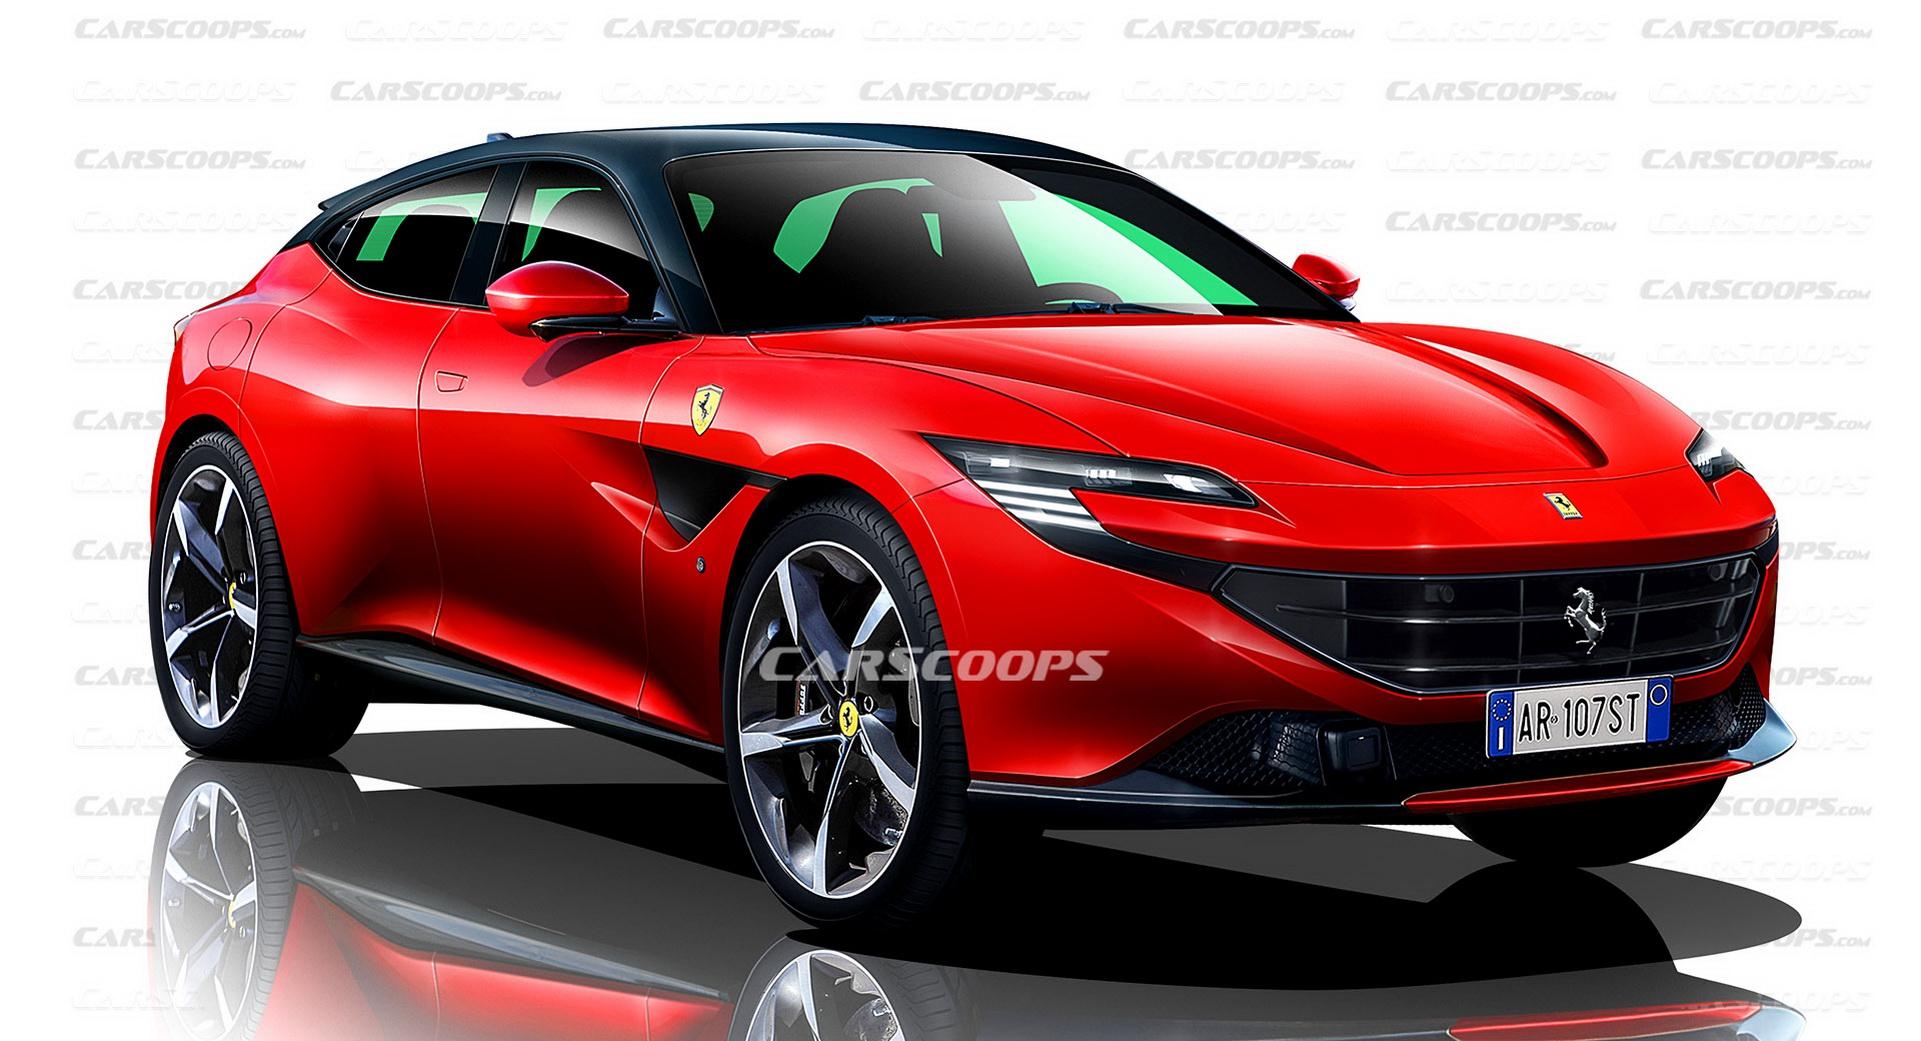 Ferrari-Purosangue-SUV-Car-Scoops-4-2